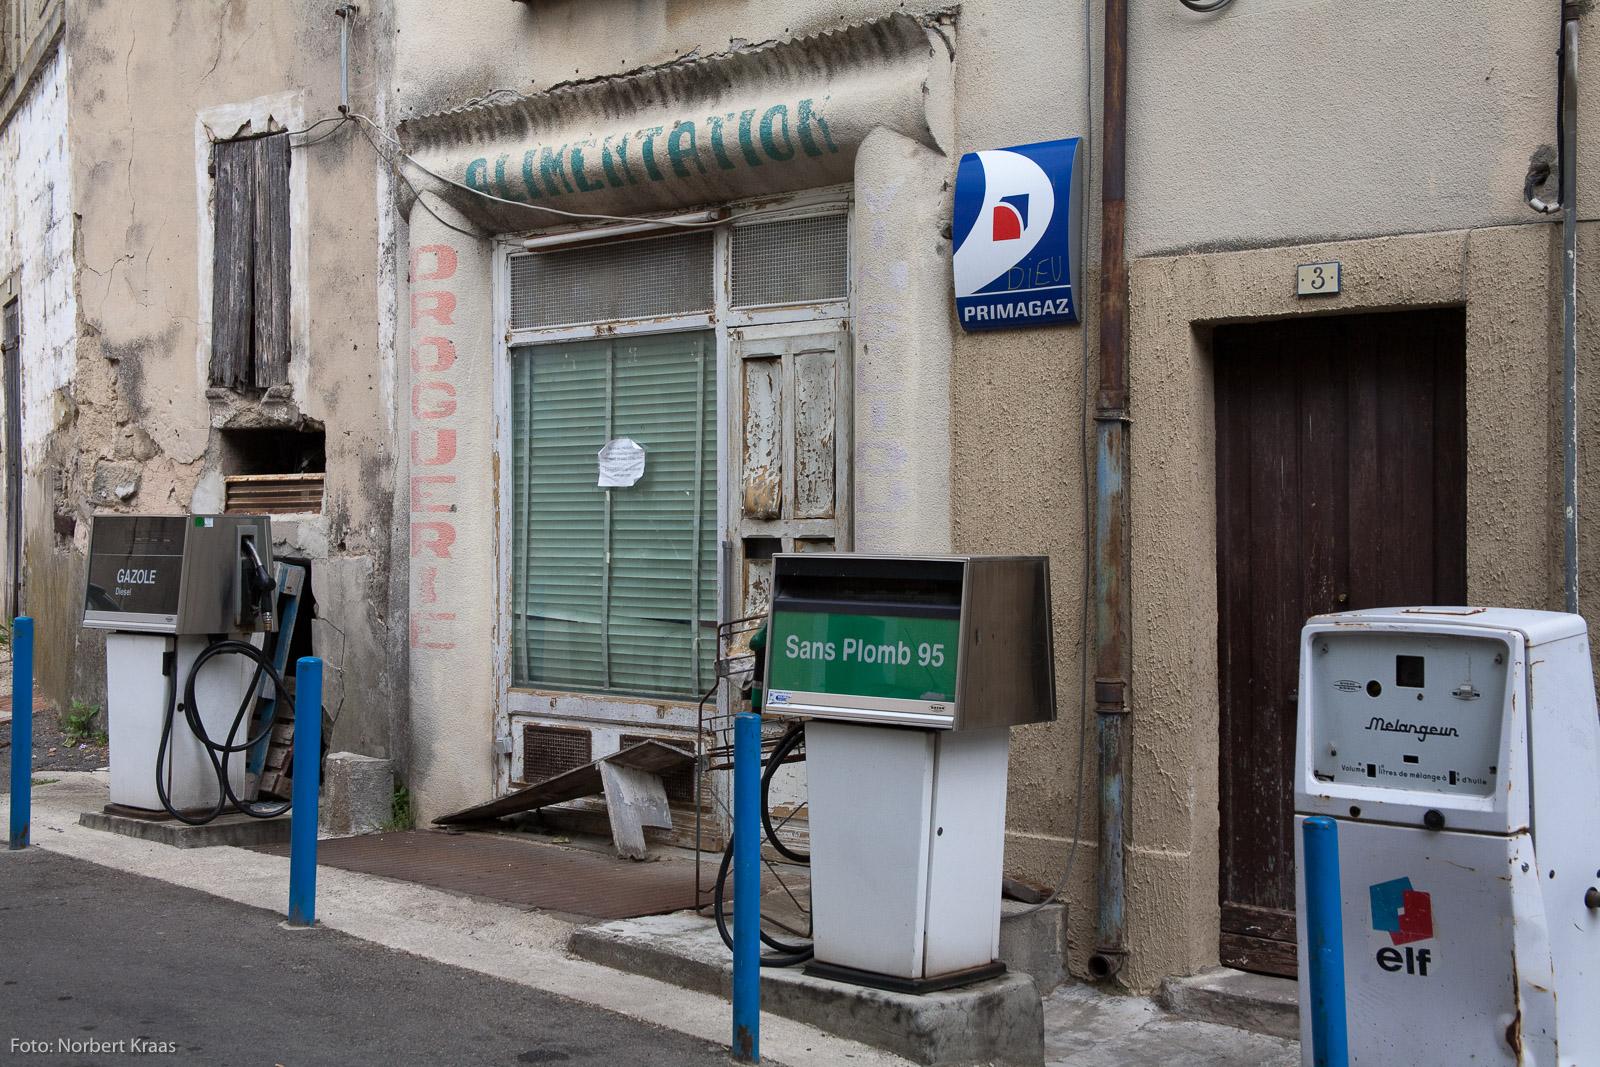 Wo tankt man Zuversicht in schwierigen Zeiten? Verlassener Laden in Saint-Quentin-la-Poterie, Languedoc.